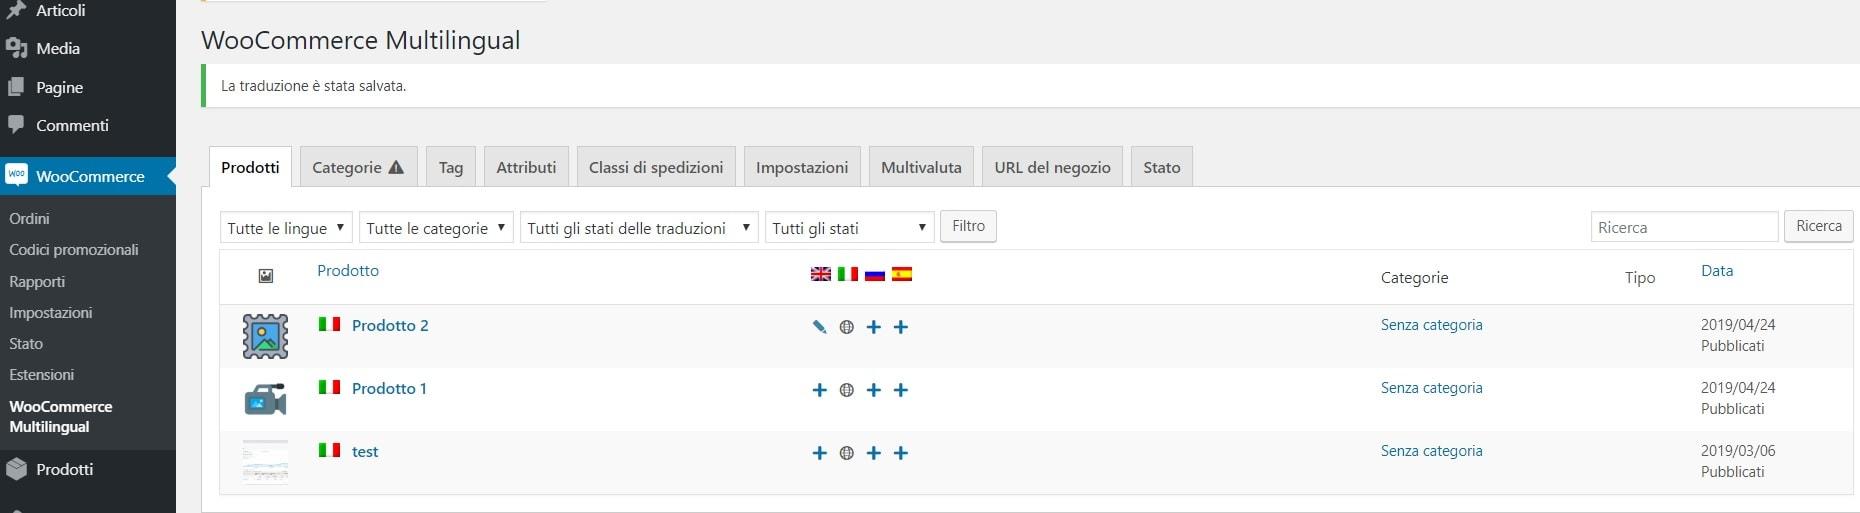 prodotti Woocommerce Multilingual